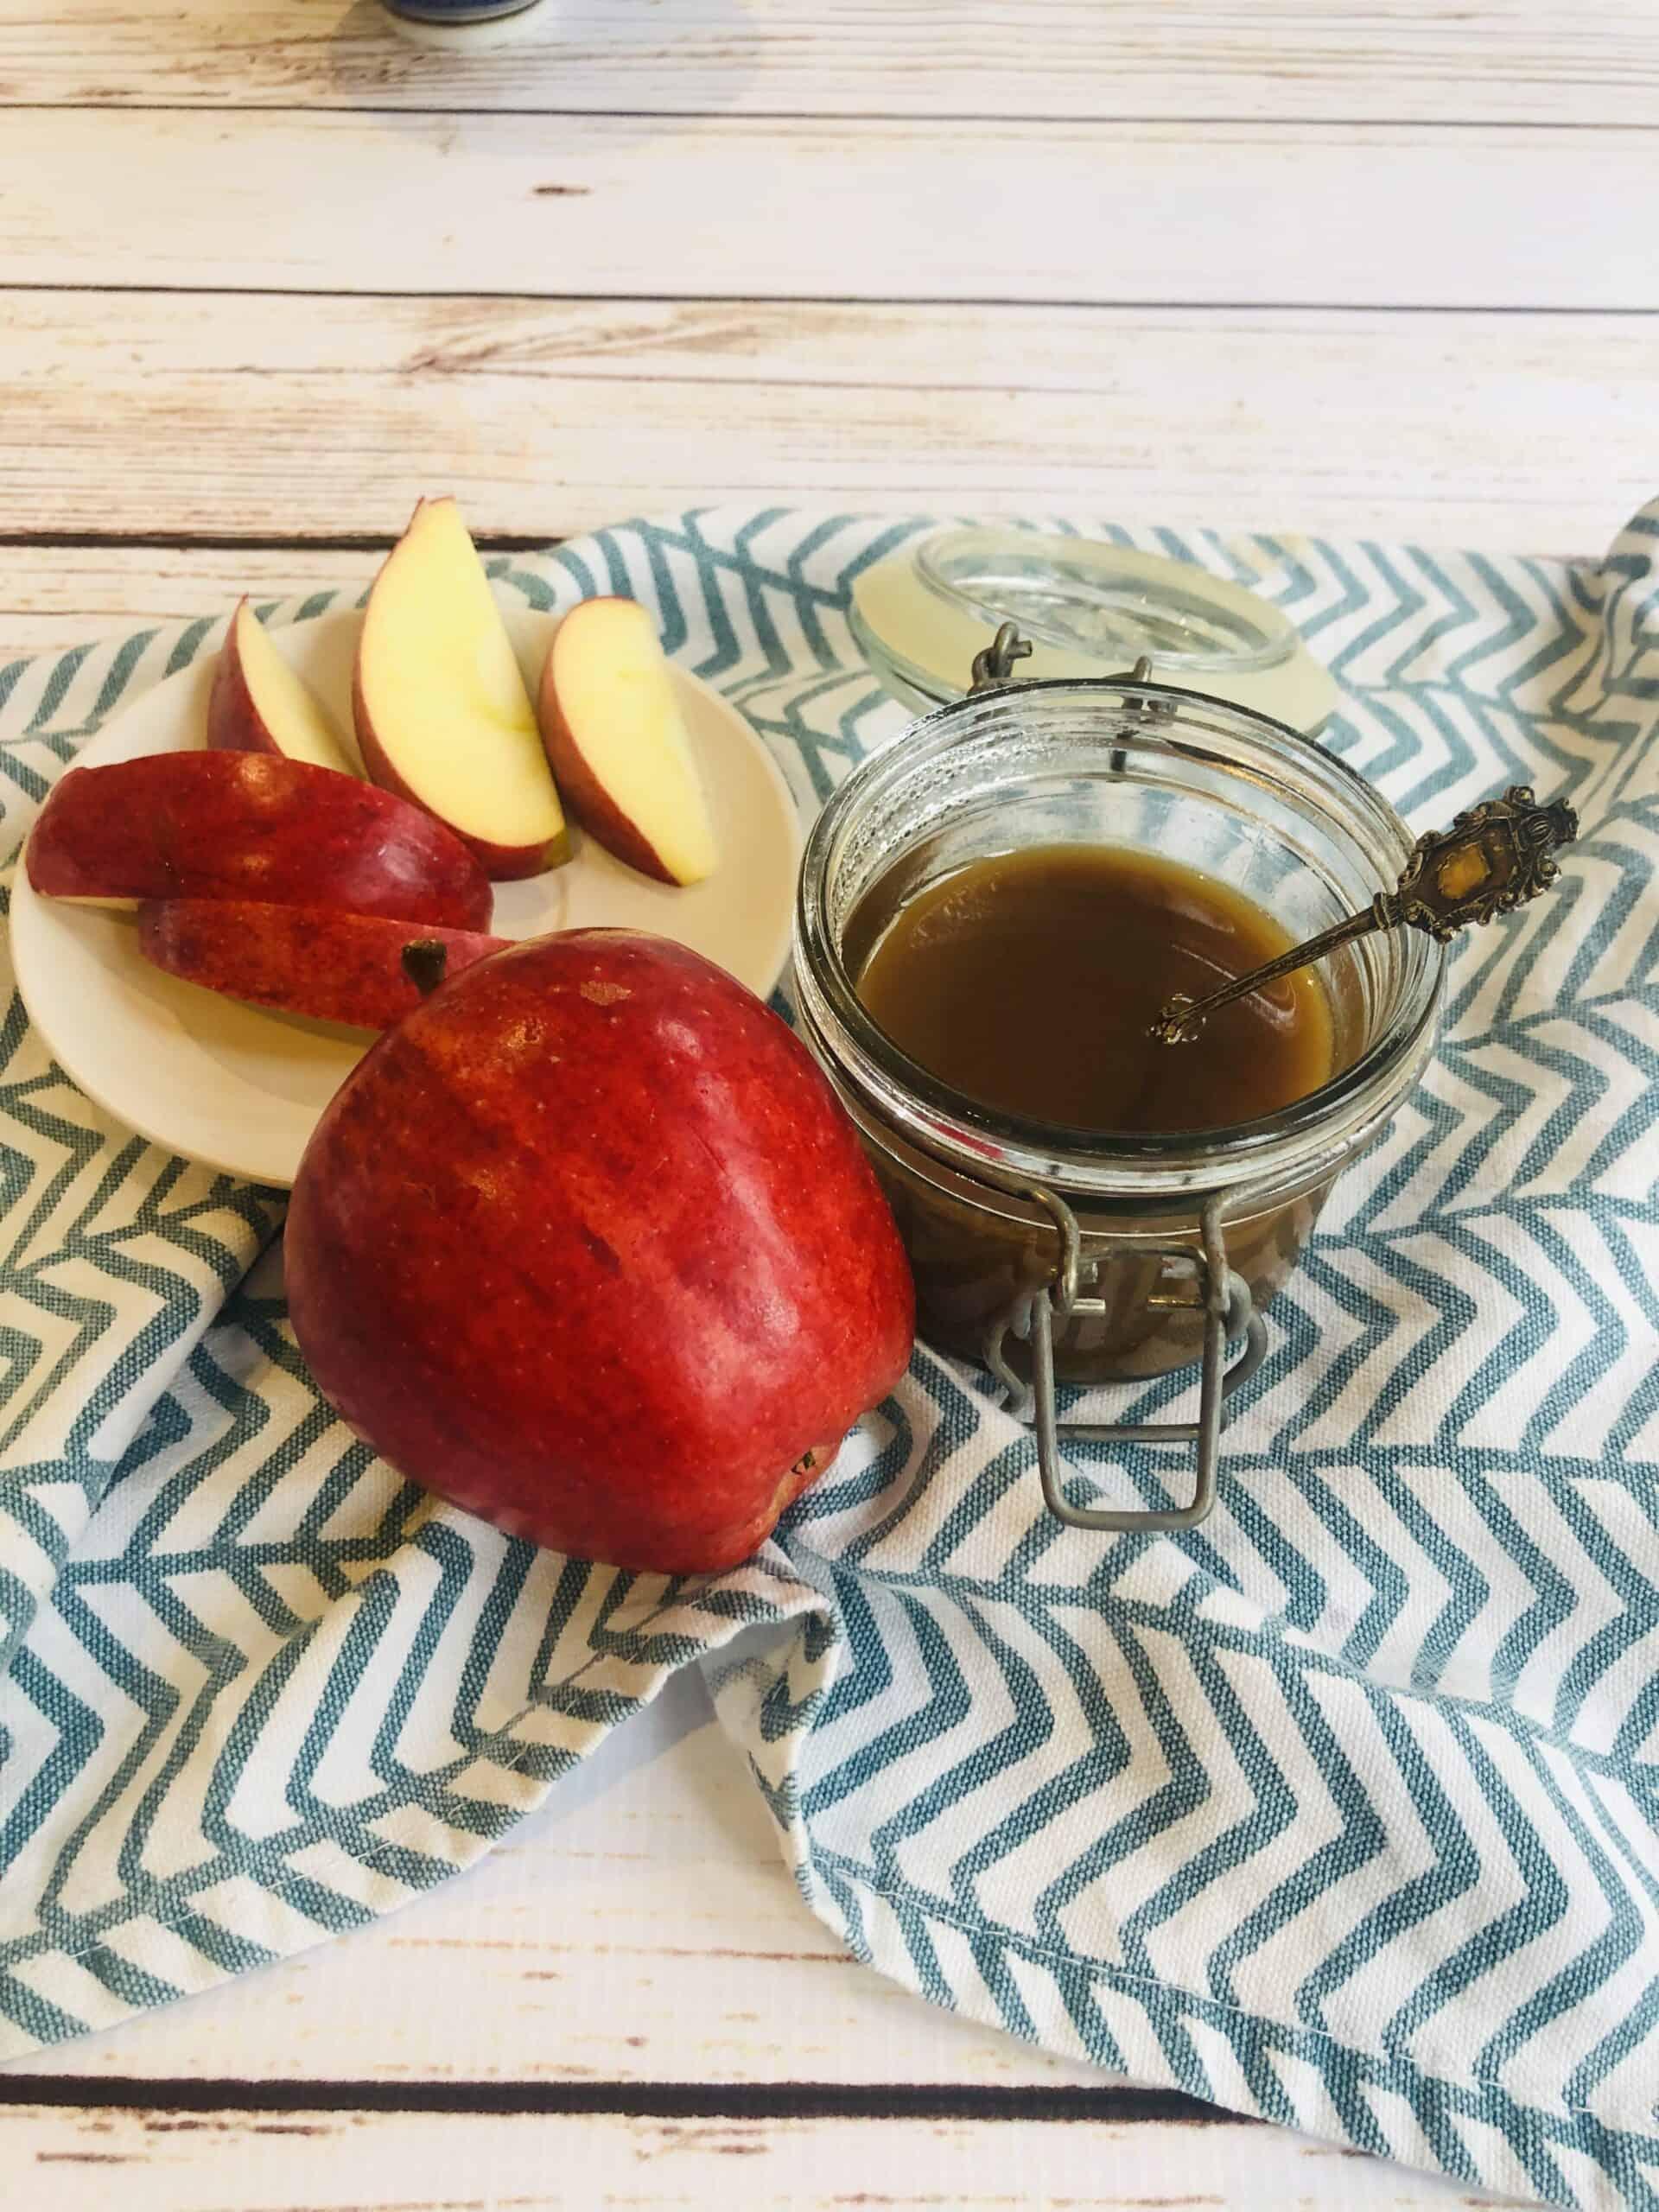 Easy Vegan Caramel Sauce Recipe | Dairy Free Caramel Sauce